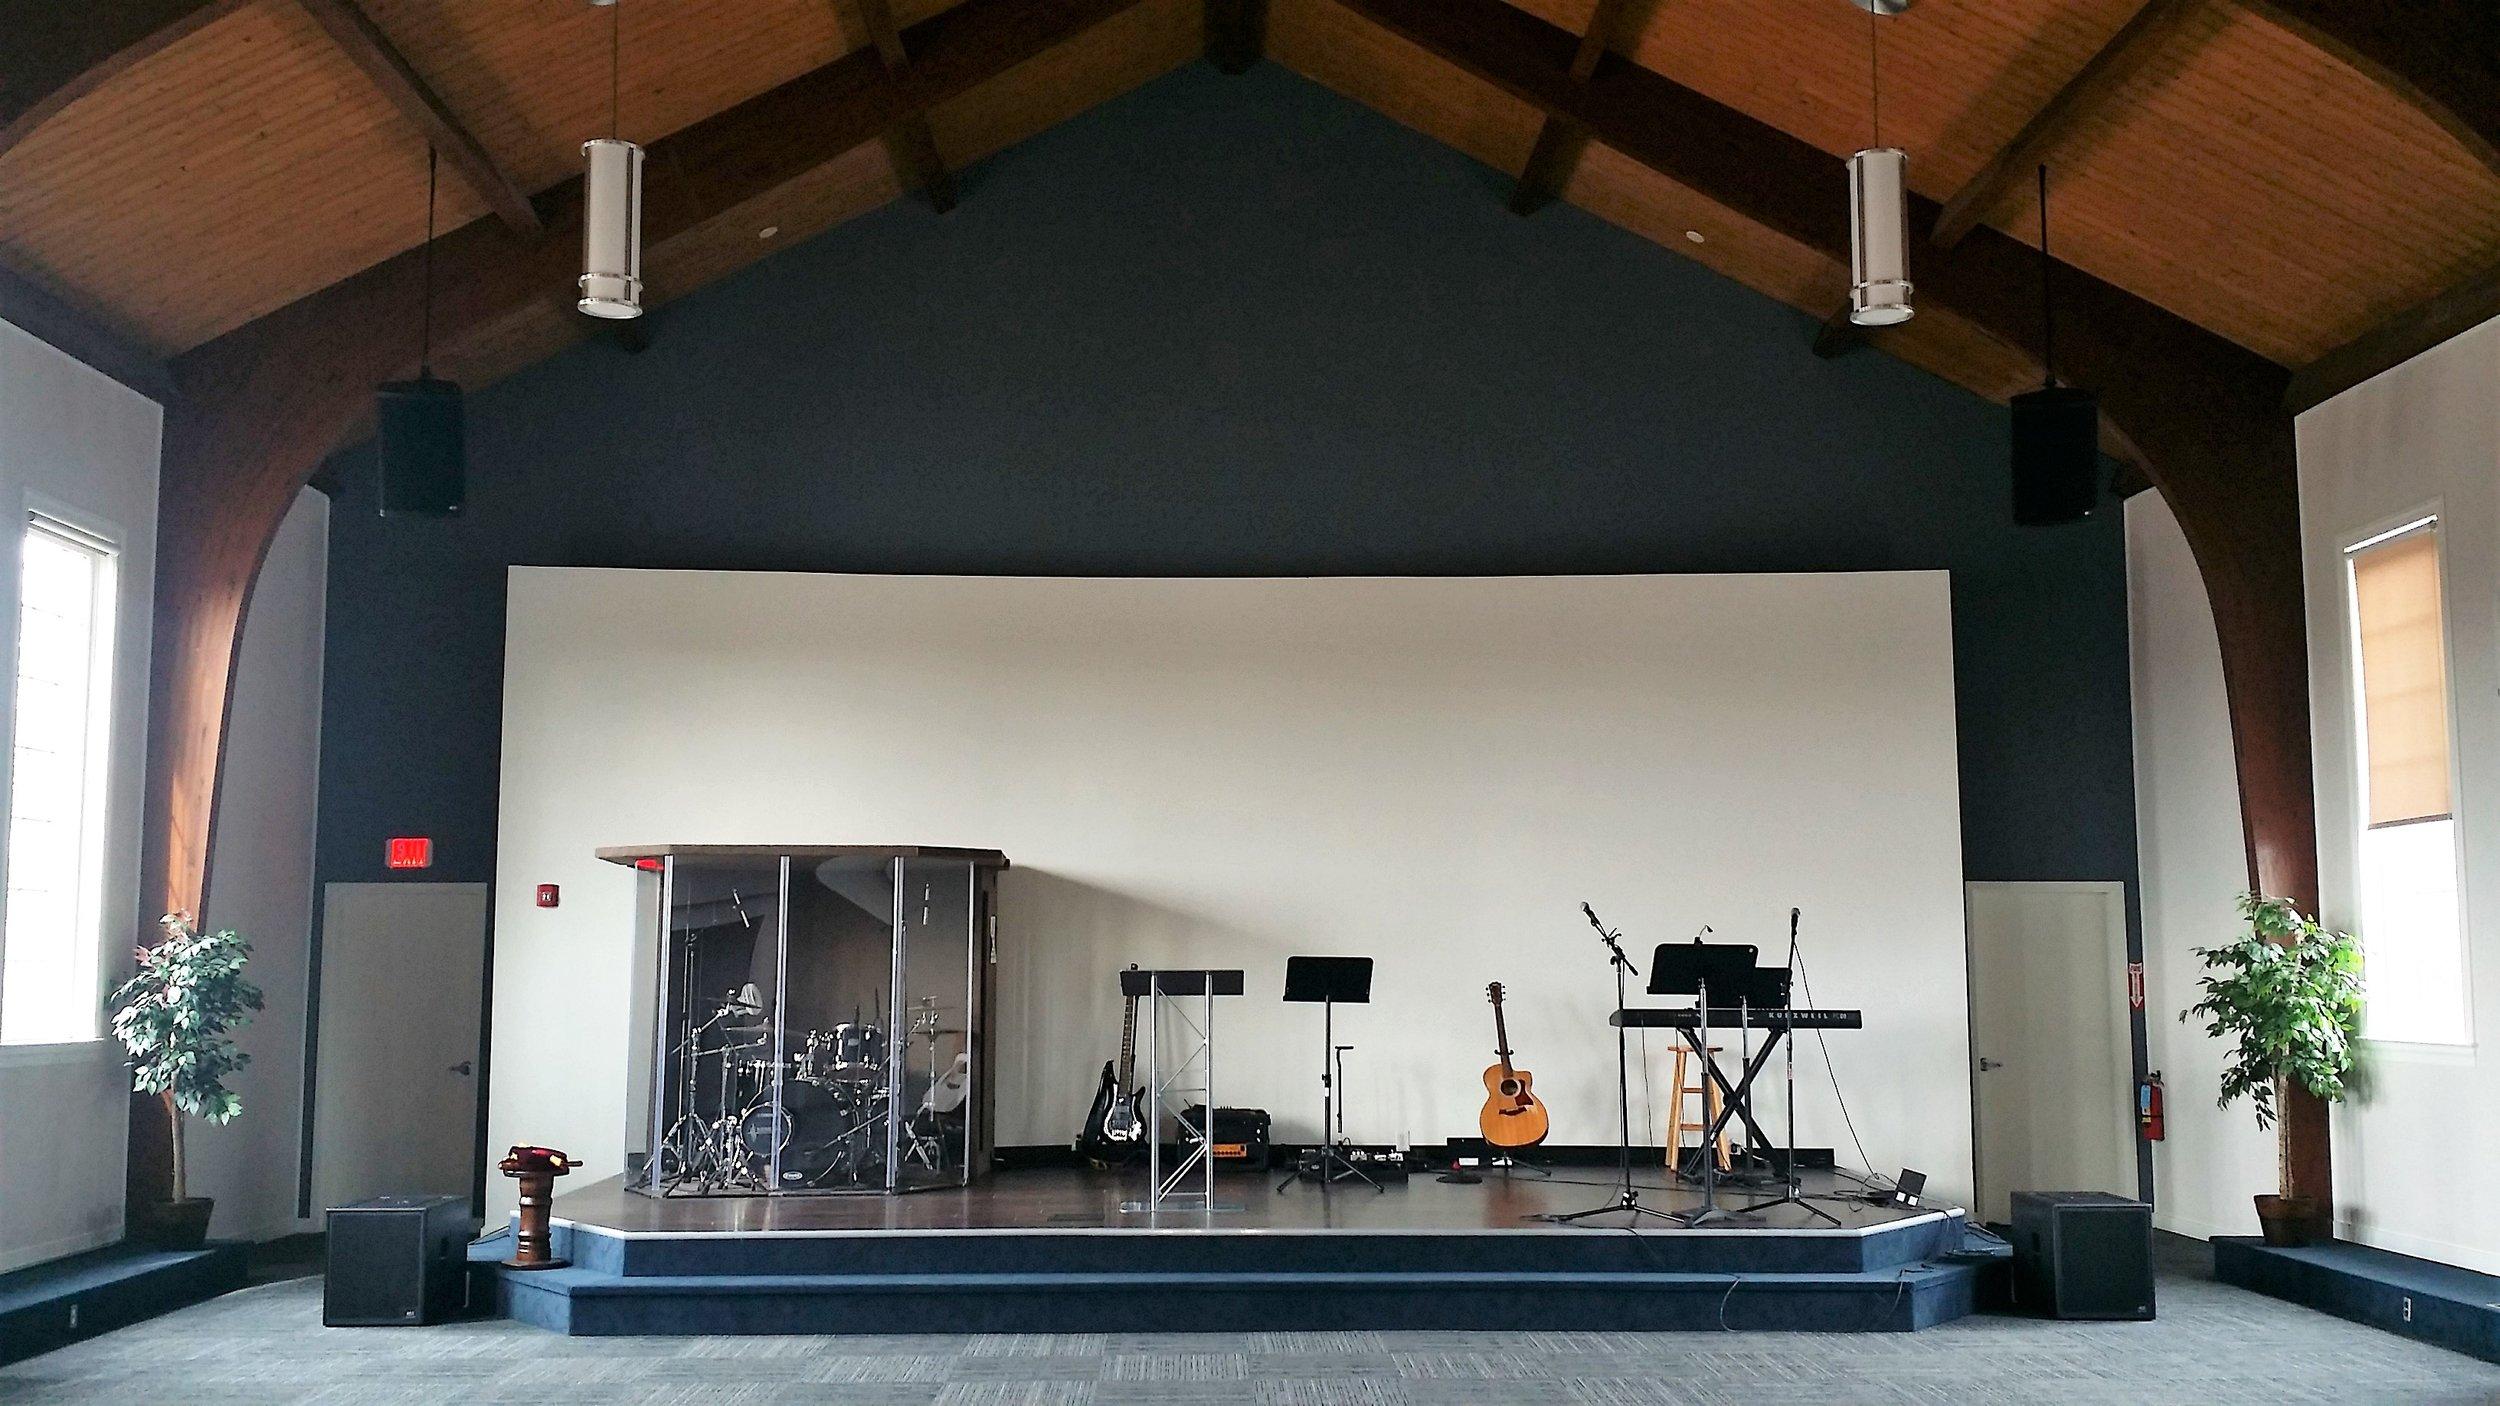 Cornerstone - Korean Presbyterian Church of Washington